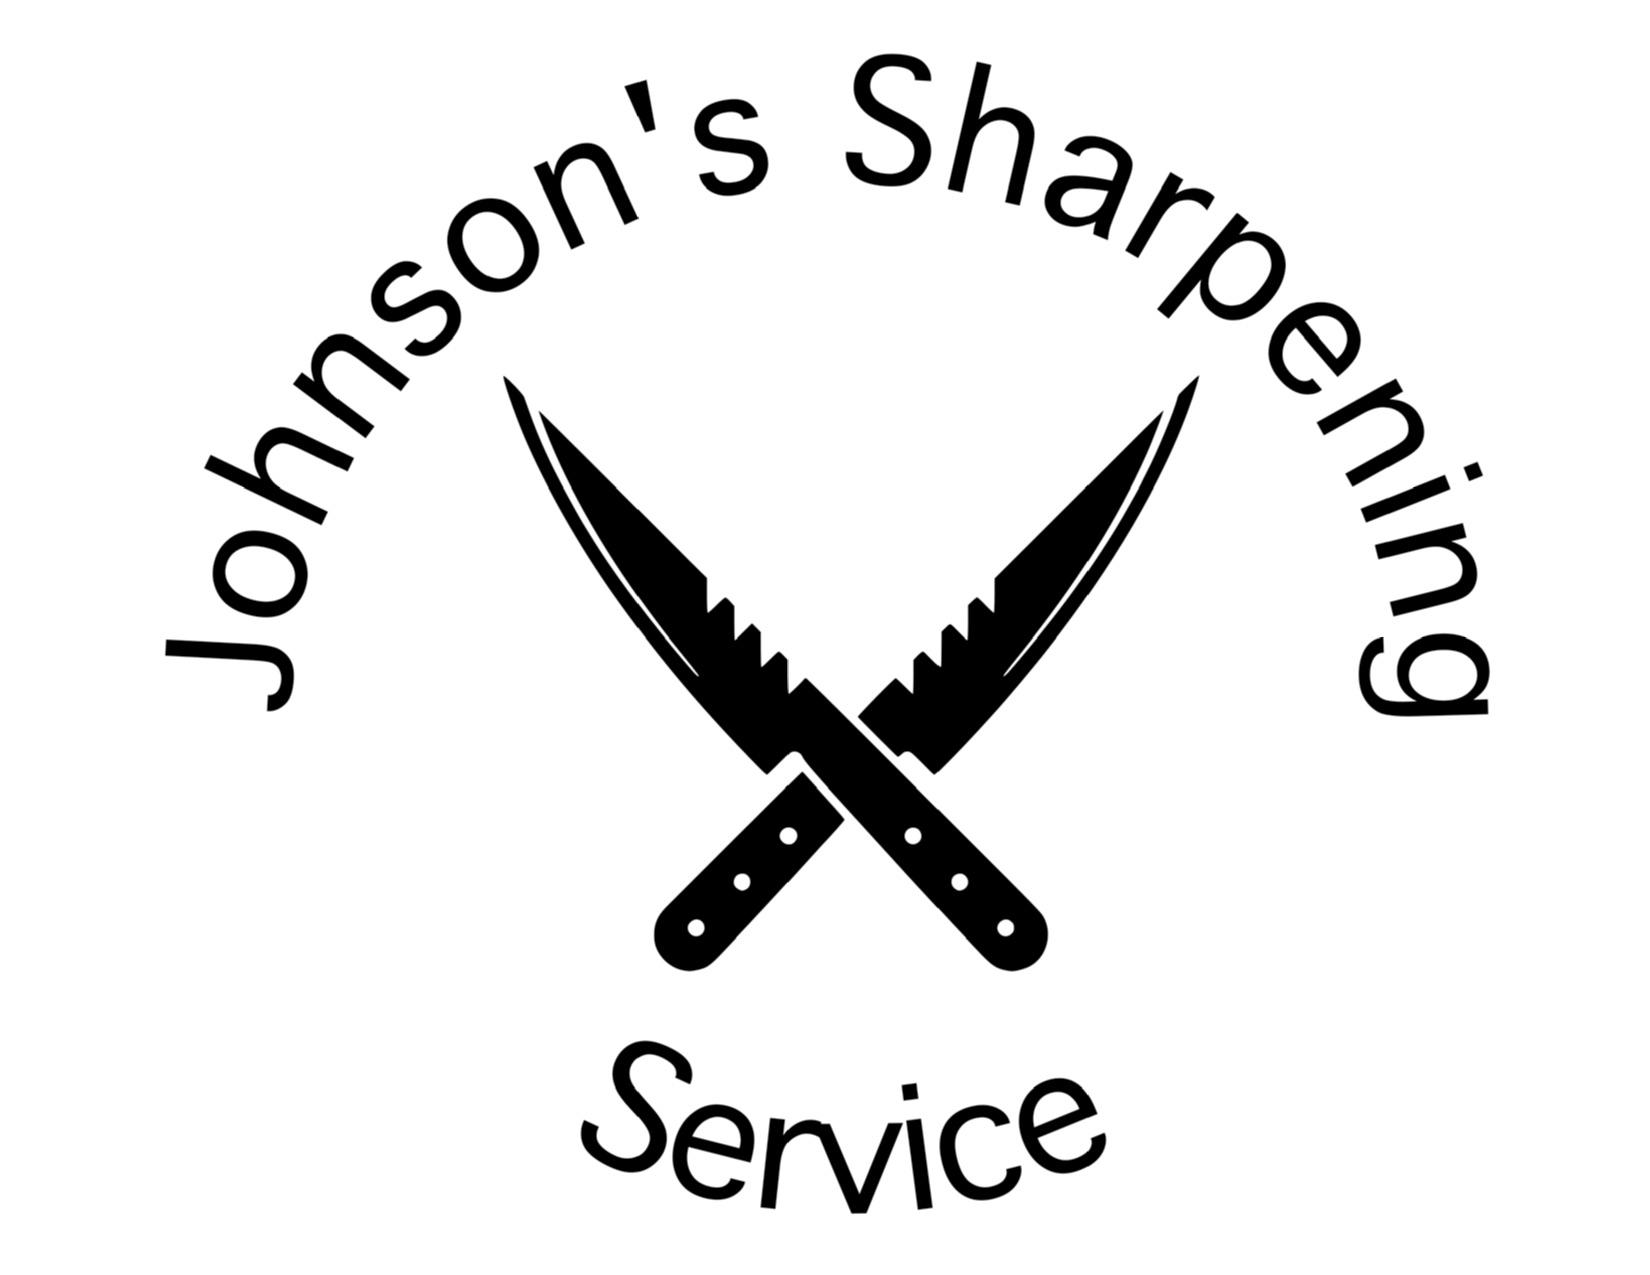 Johnson's Sharpening Service